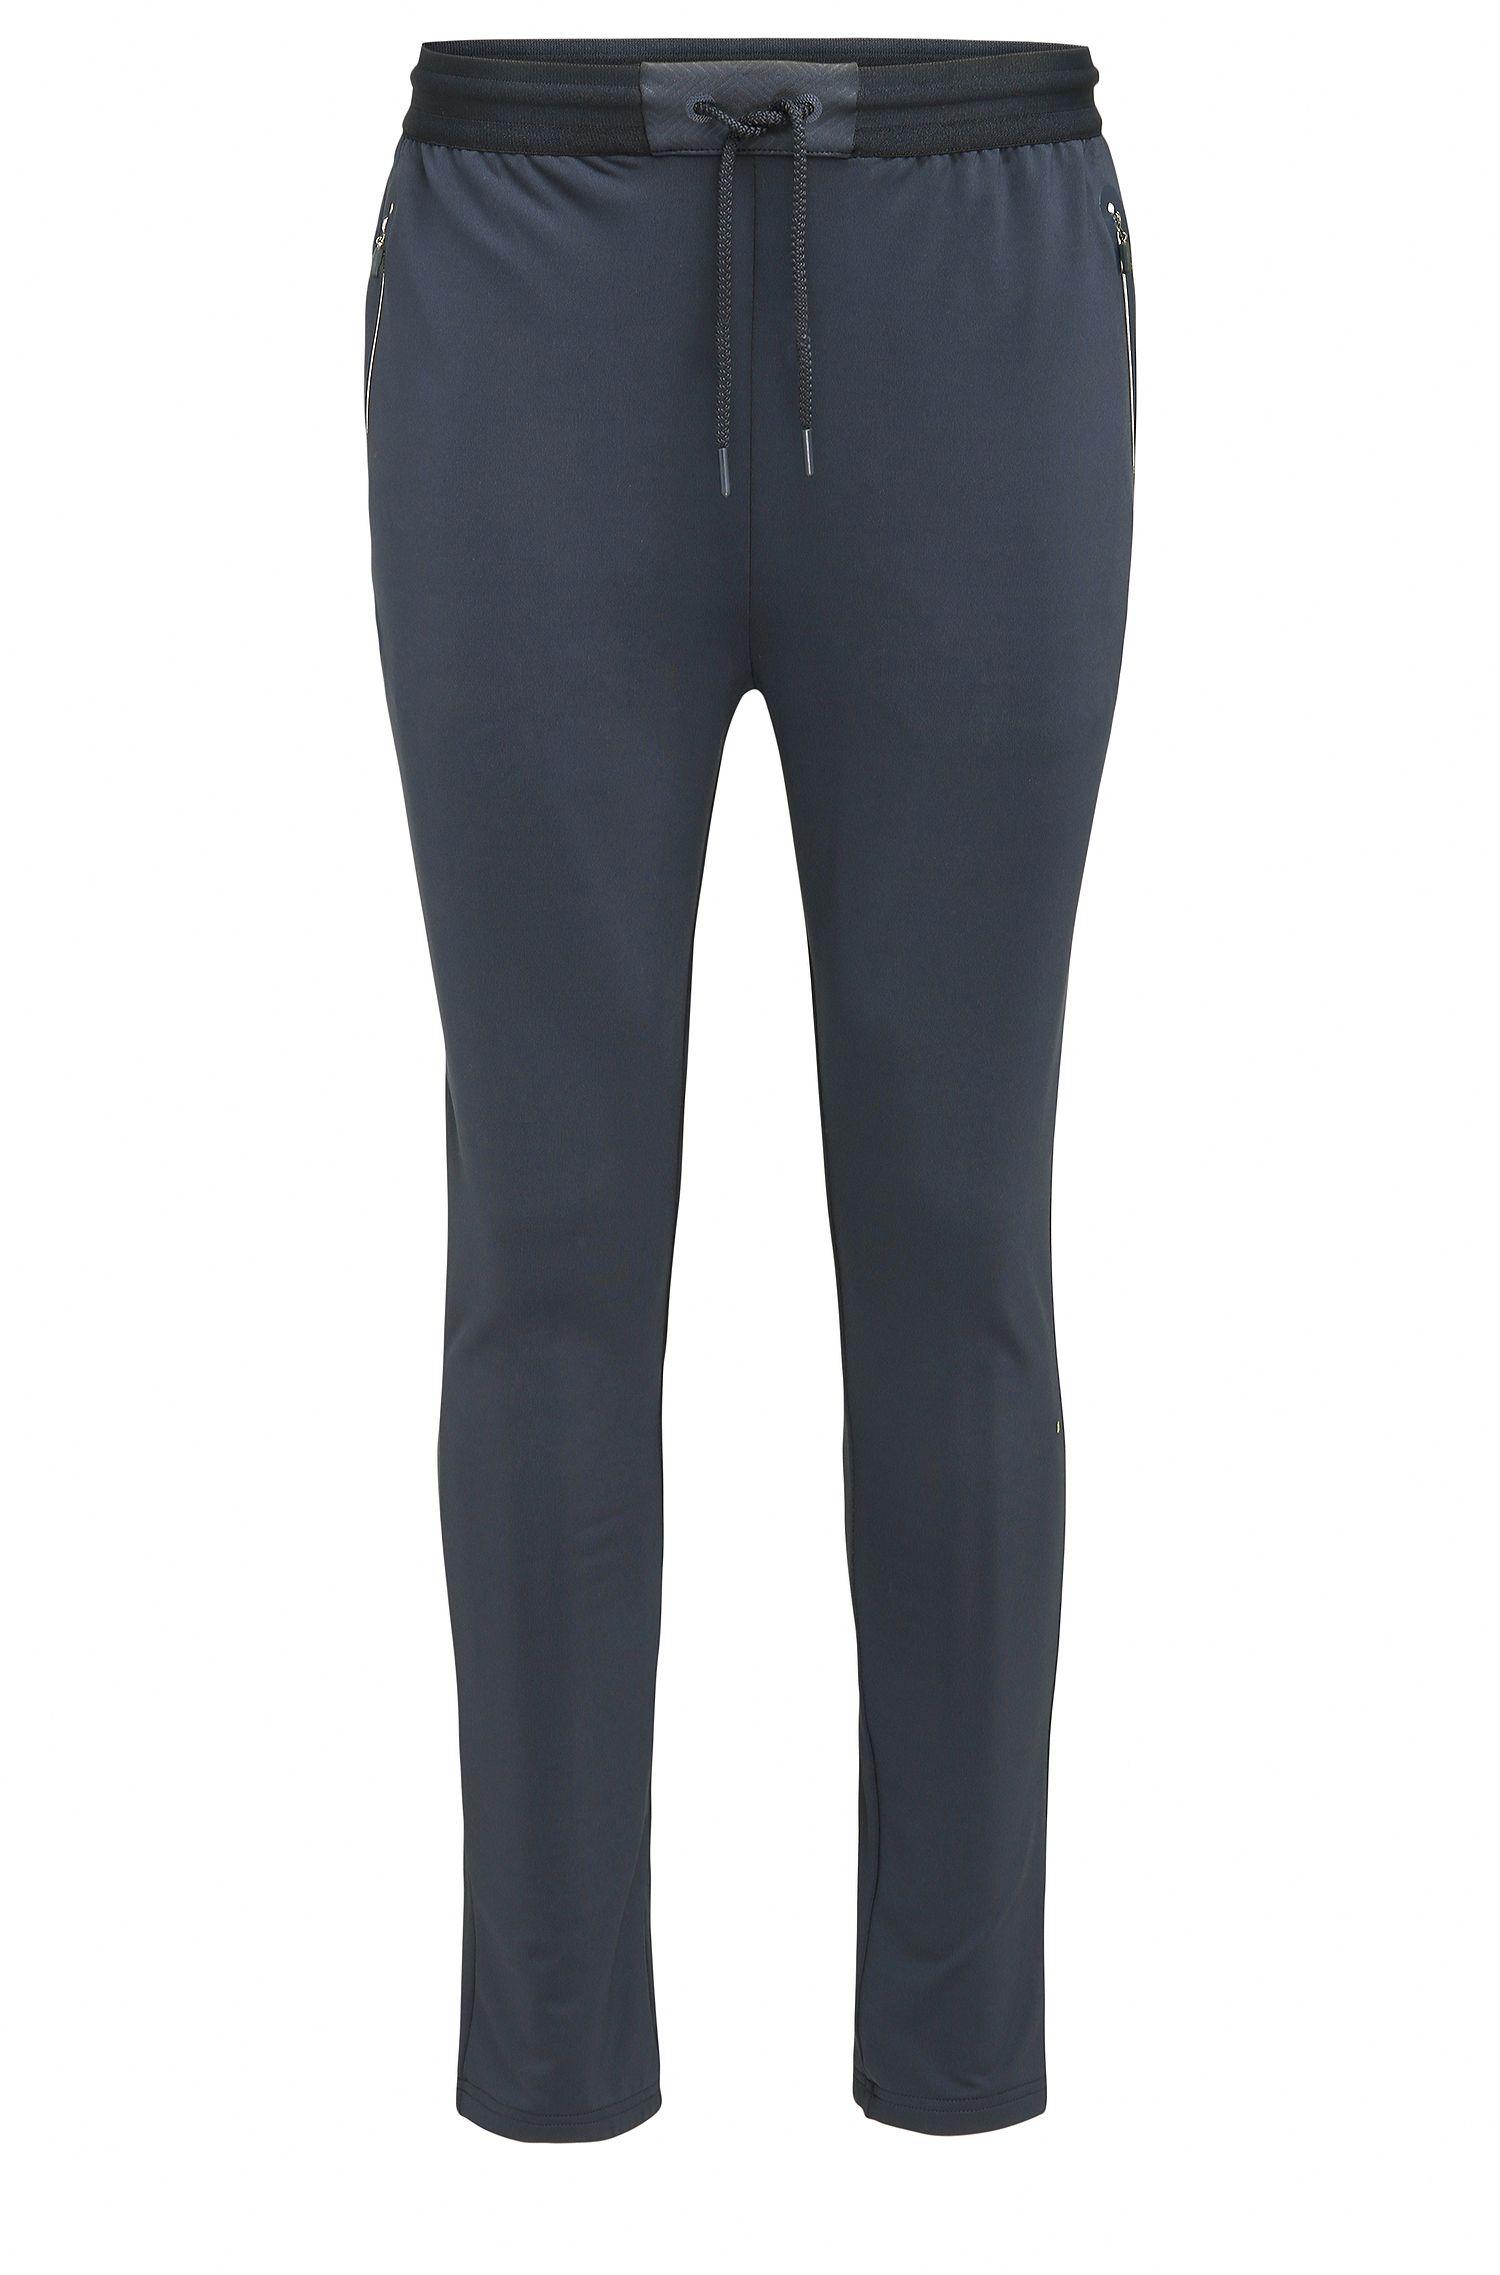 Nylon Pants | Horatech